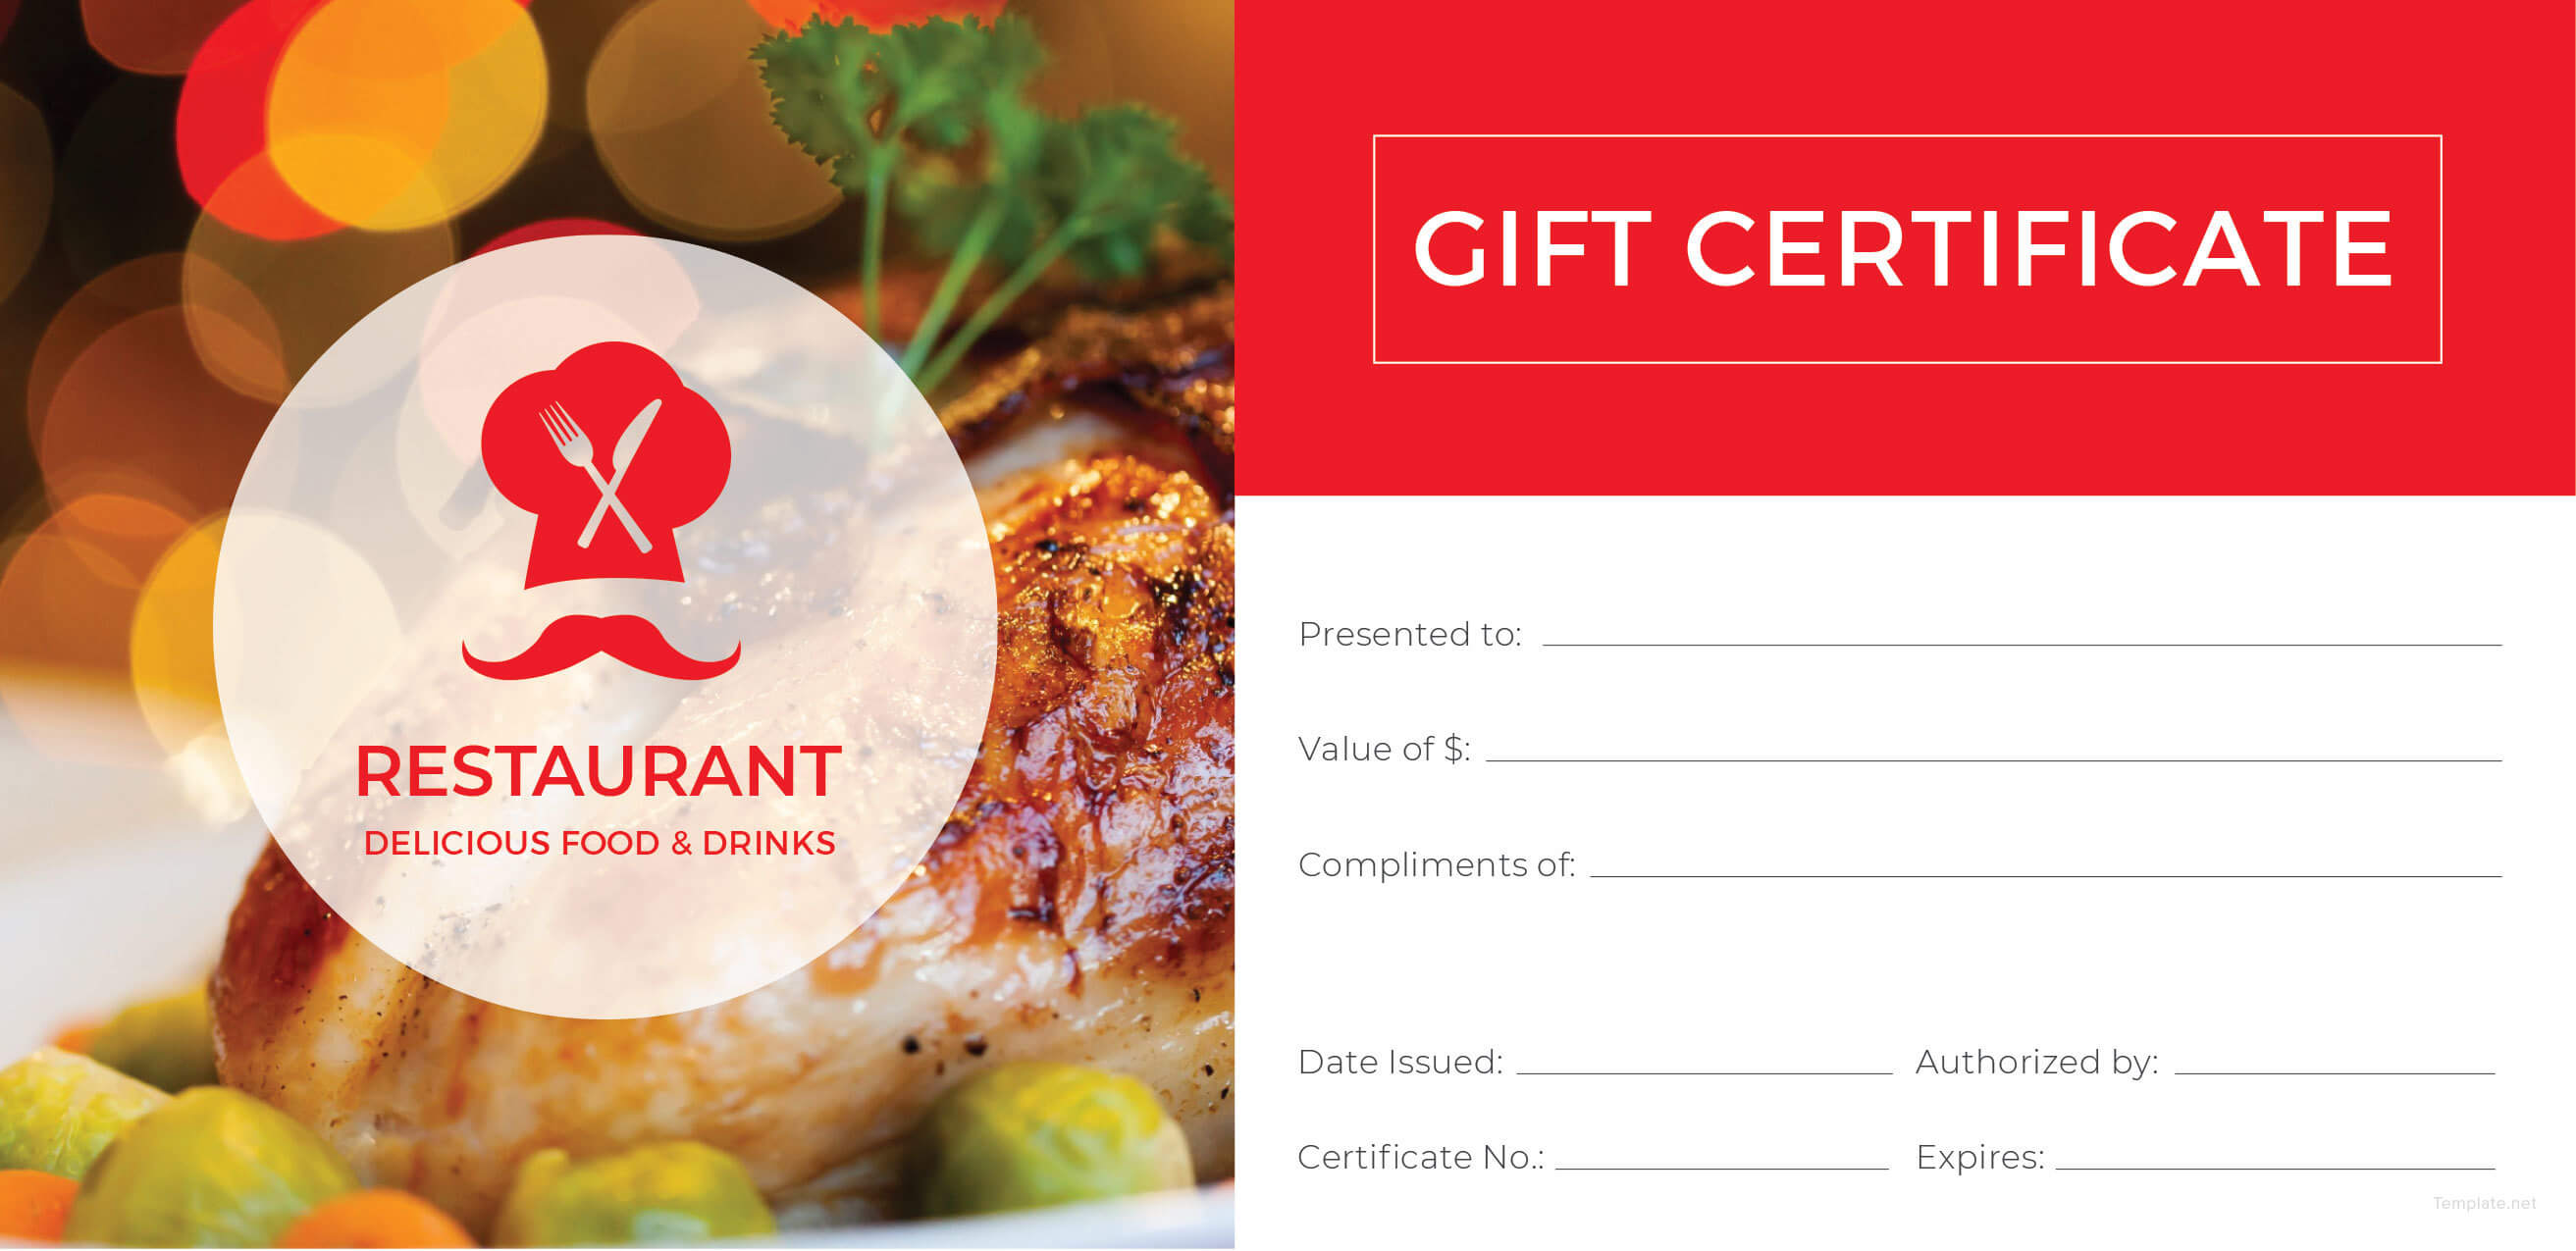 006 Restaurant Gift Certificate Template Vintage Regarding Restaurant Gift Certificate Template